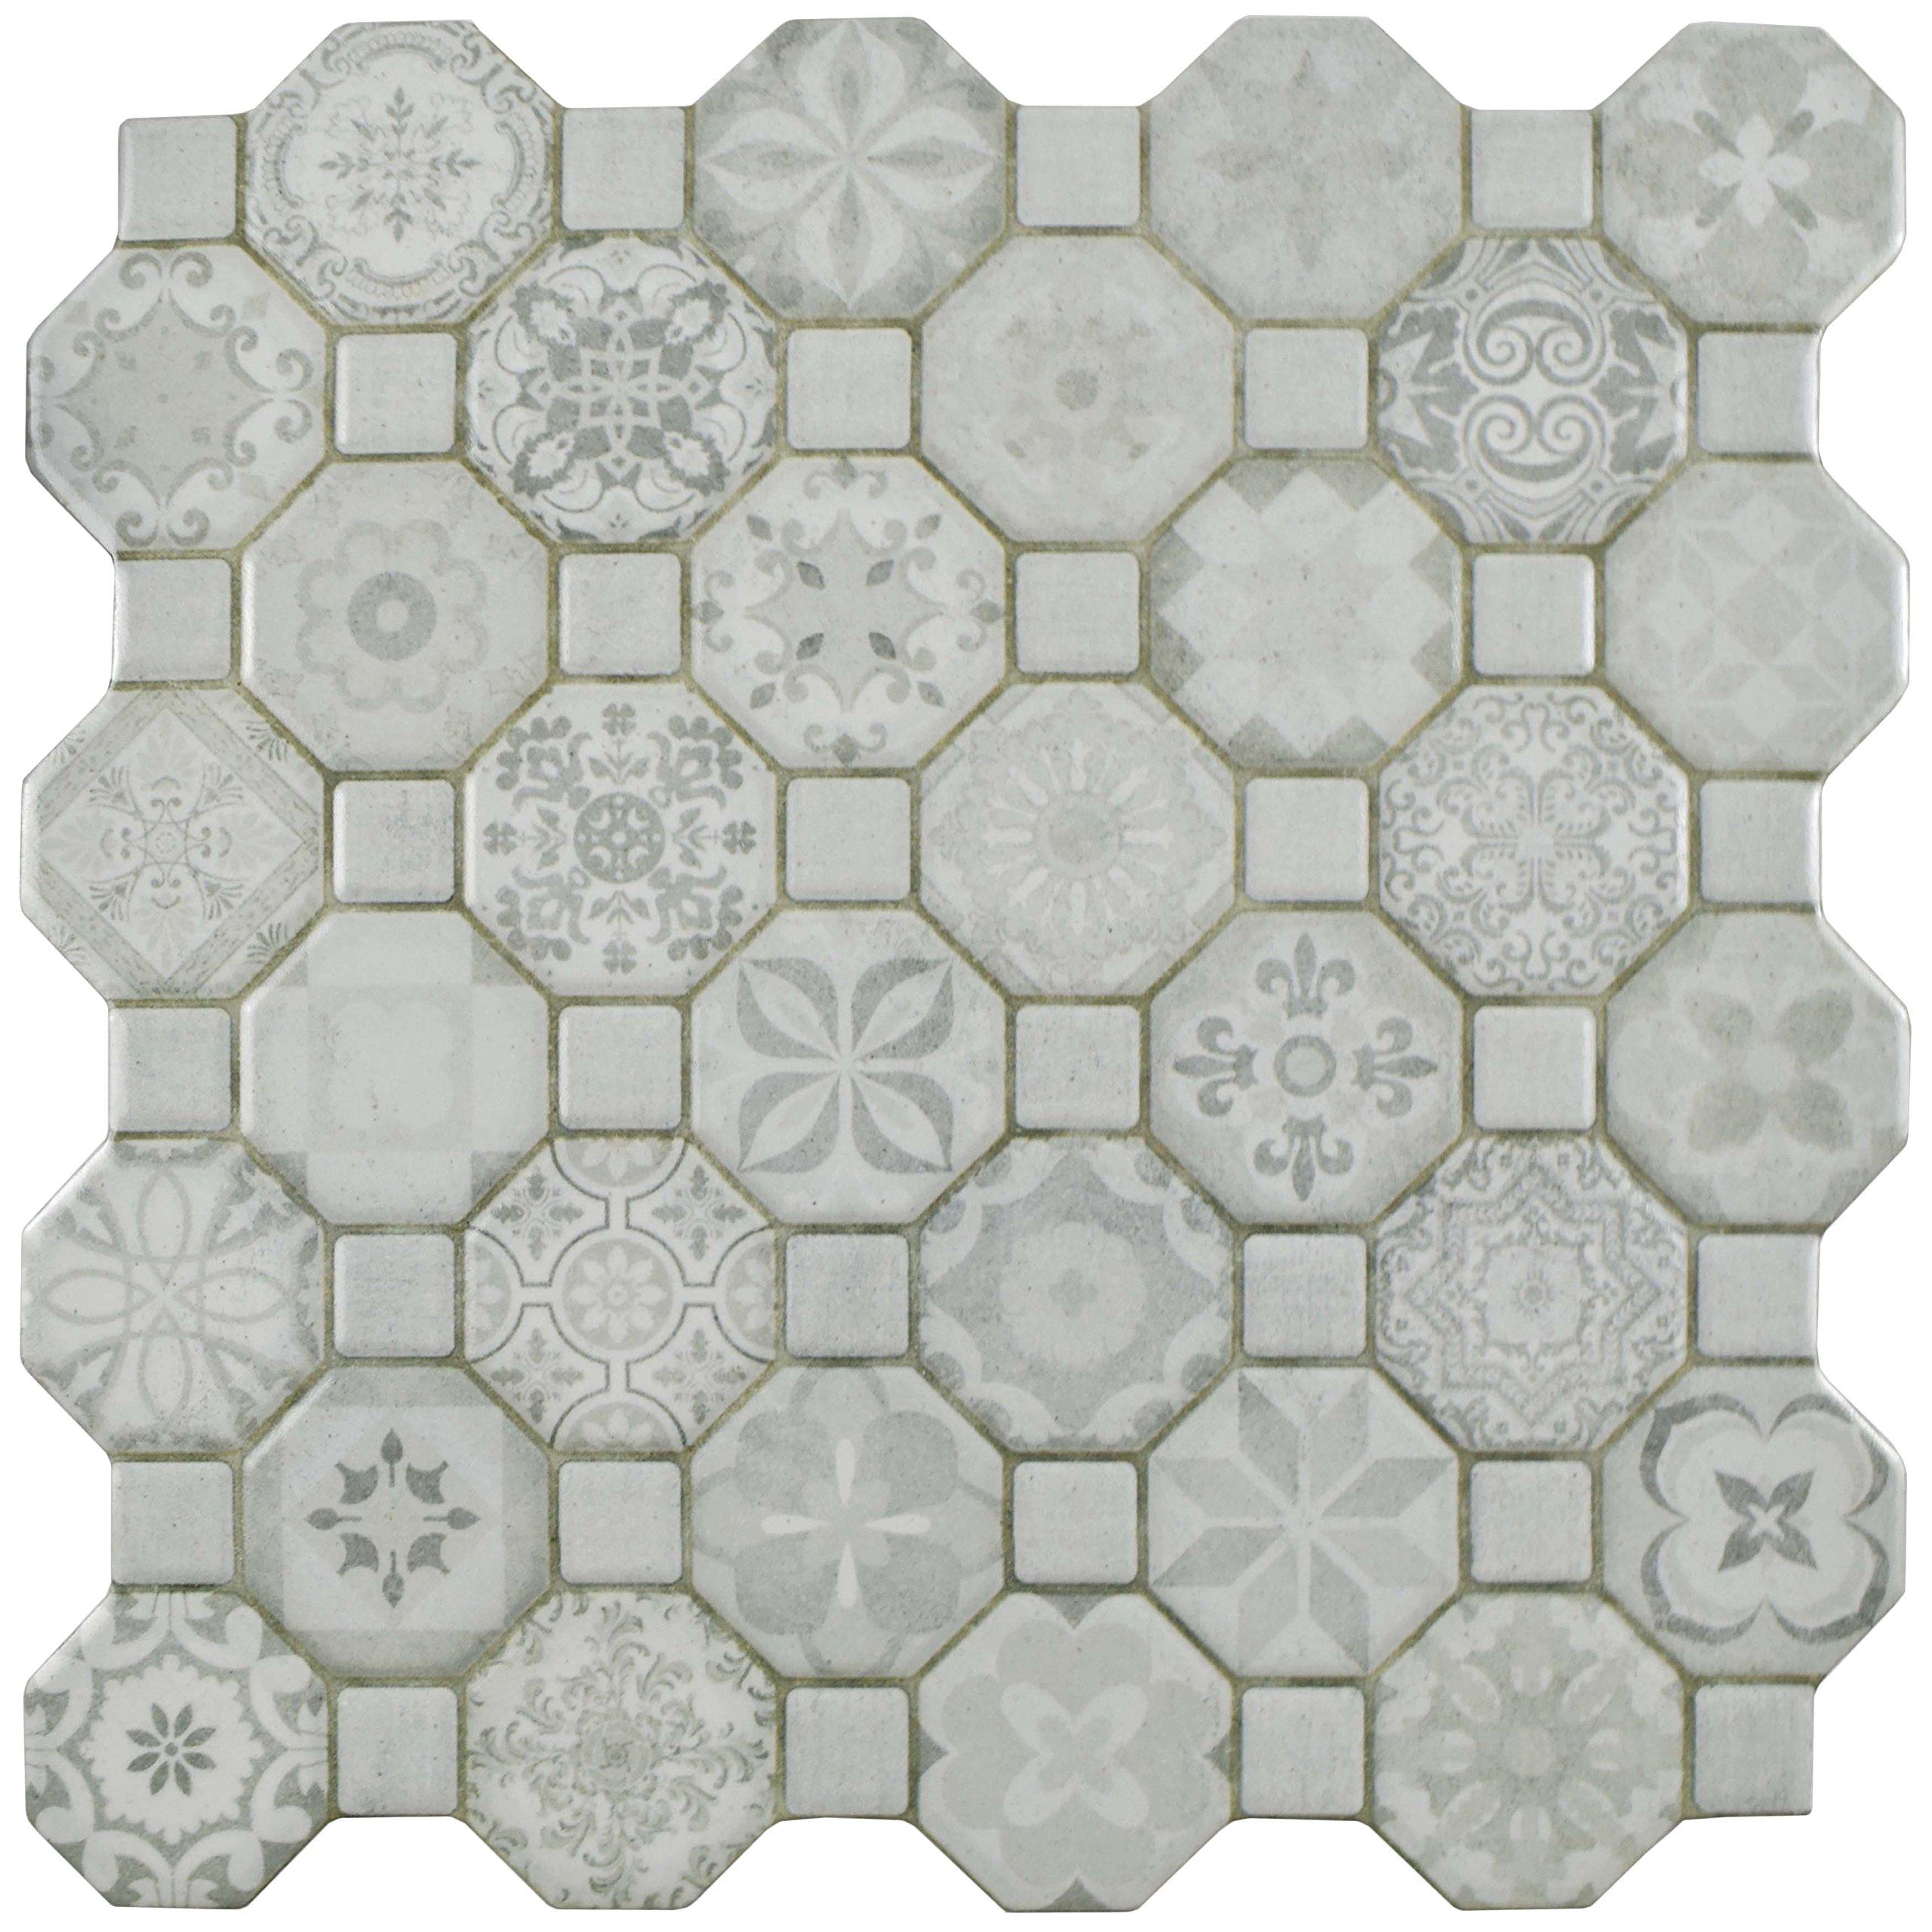 SomerTile FOSTESWT Abacu Ceramic Floor & Wall Tile, 12.25'' x 12.25'', White, White, Grey